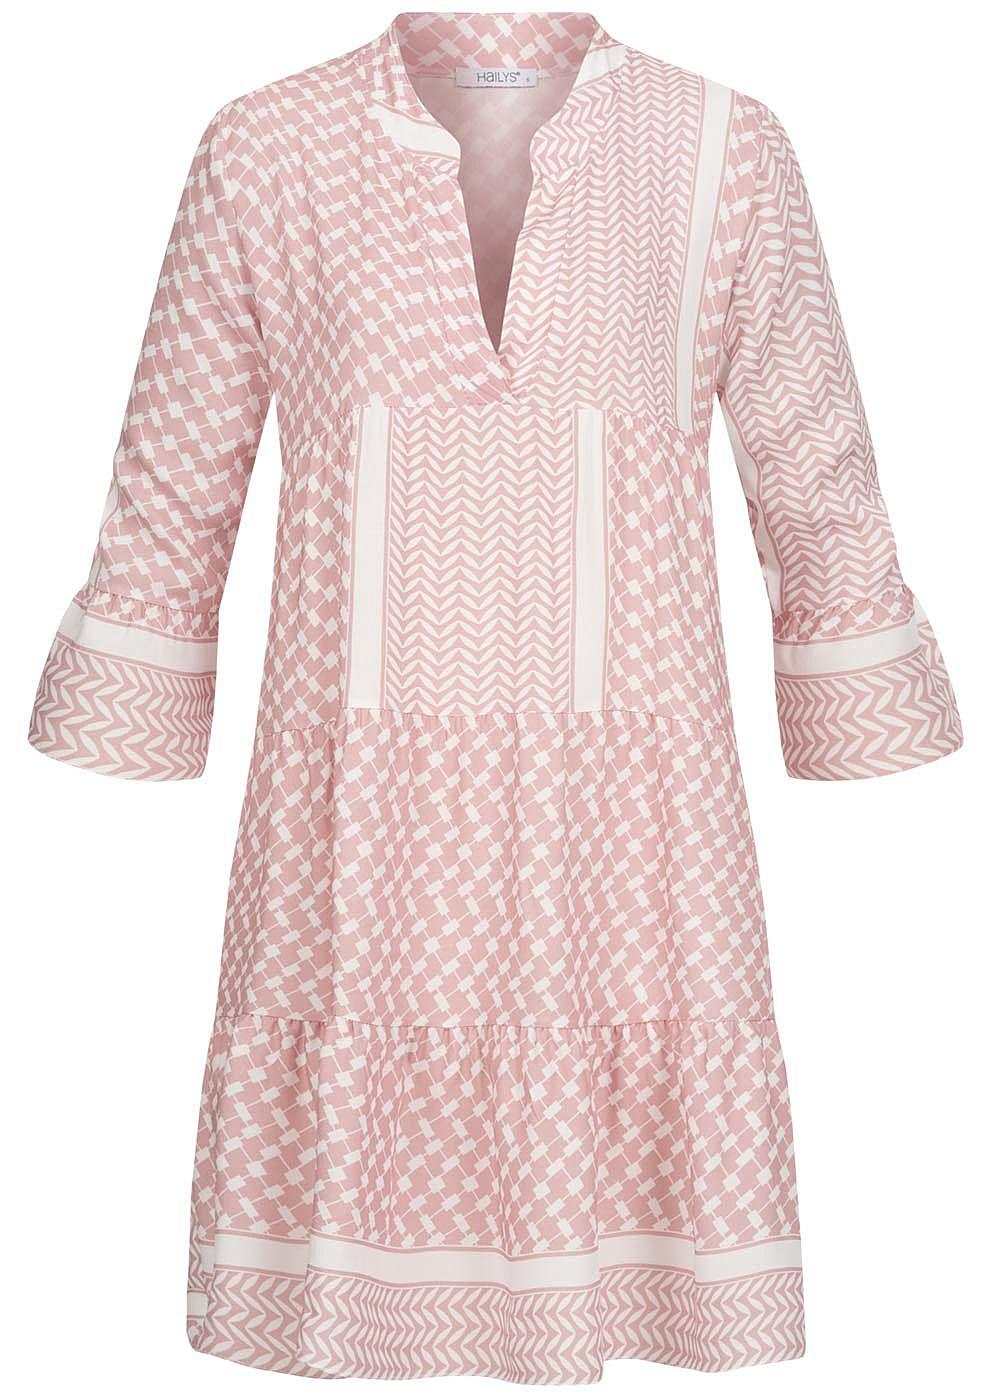 Hailys Damen V-Neck 118/18 Arm Puffer Kleid Allover Print rosa weiss